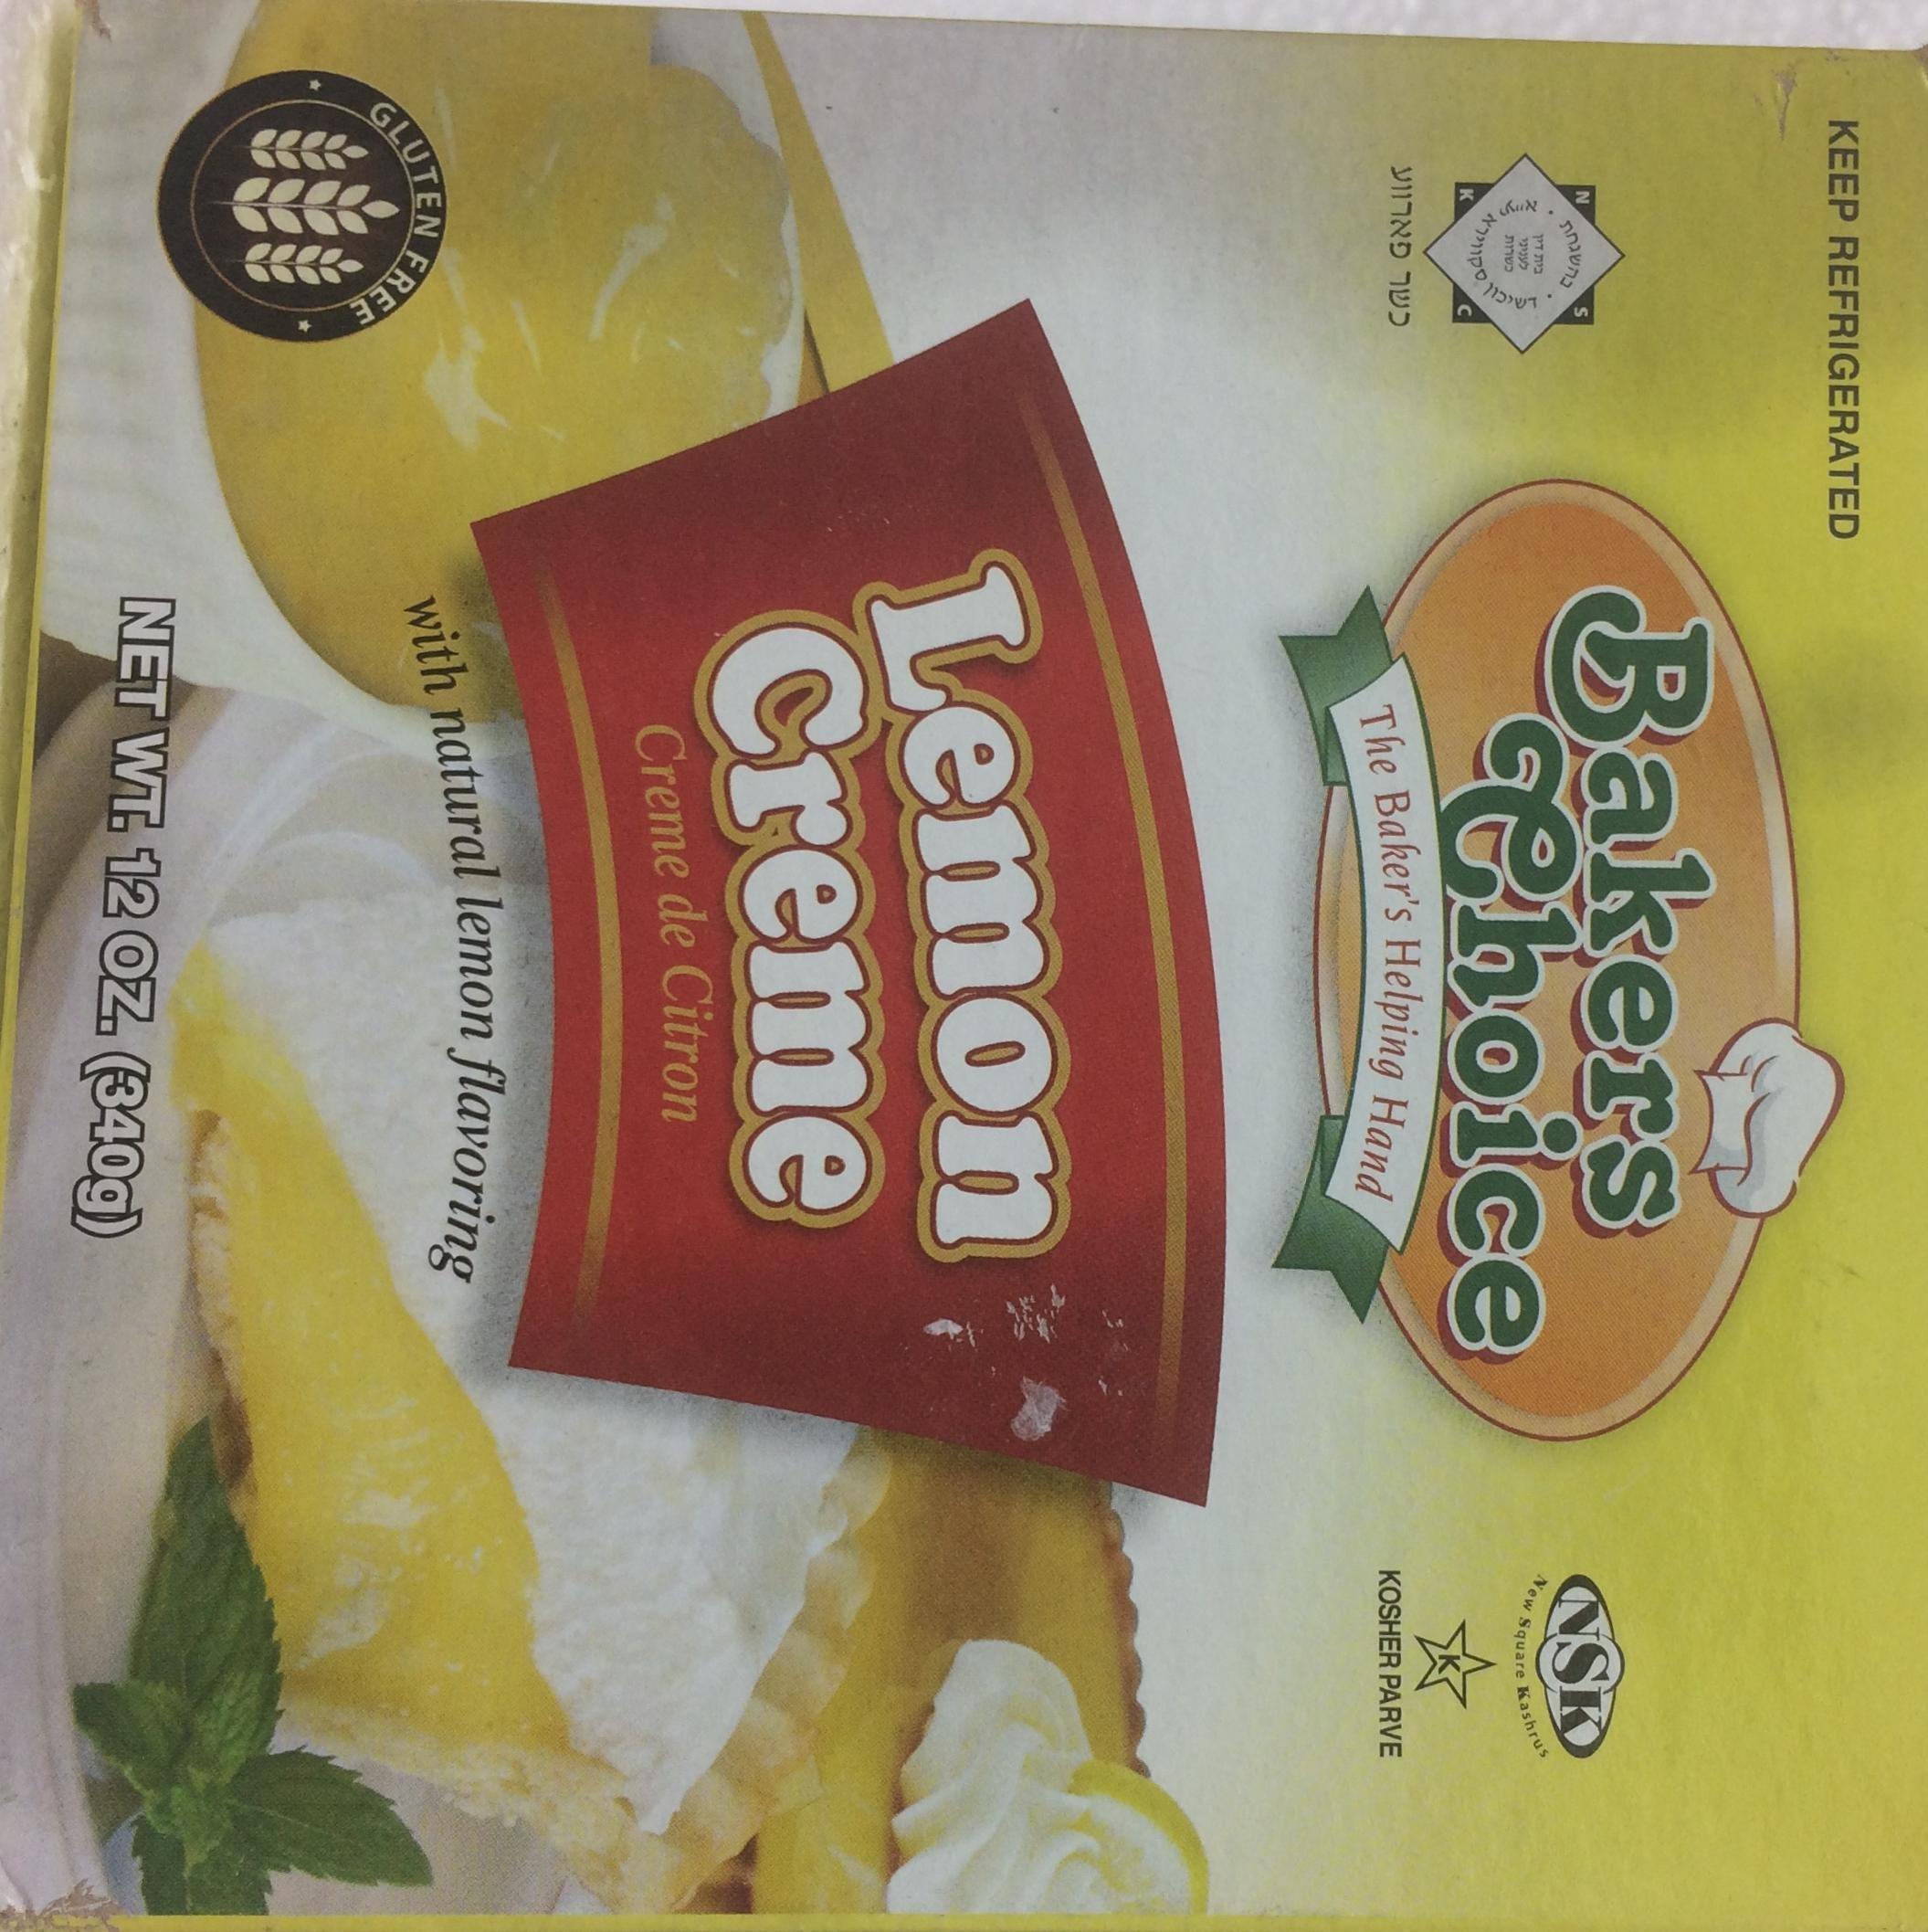 Bakers Choice Lemon Creme Gluten Free 12 Oz. Pack Of 3.